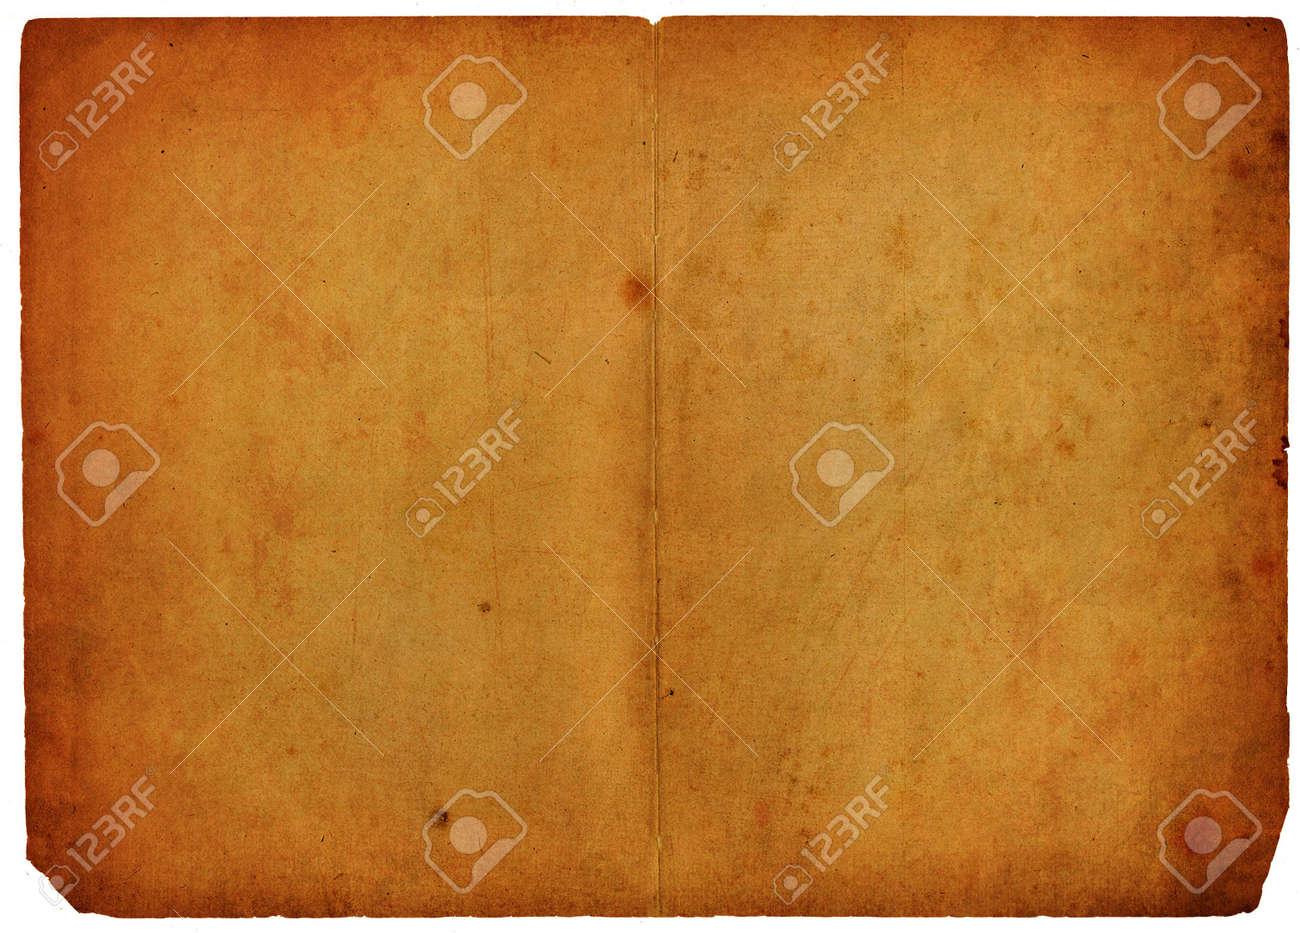 grunge notebook Stock Photo - 6838062